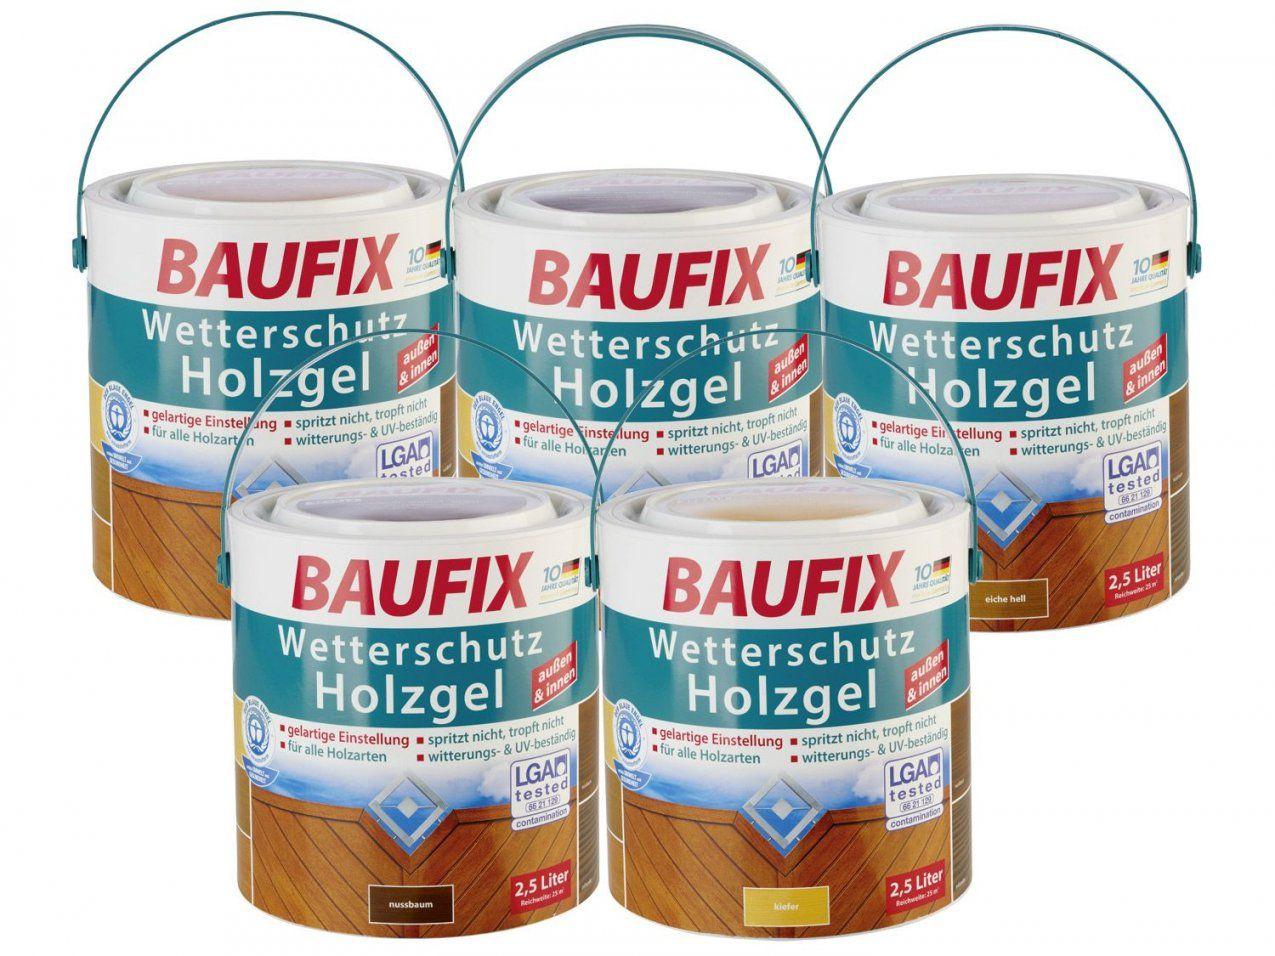 Baufix Wetterschutzholzgel 25 L  Lidl Deutschland  Lidl von Baufix Wetterschutz Holzgel Palisander Bild